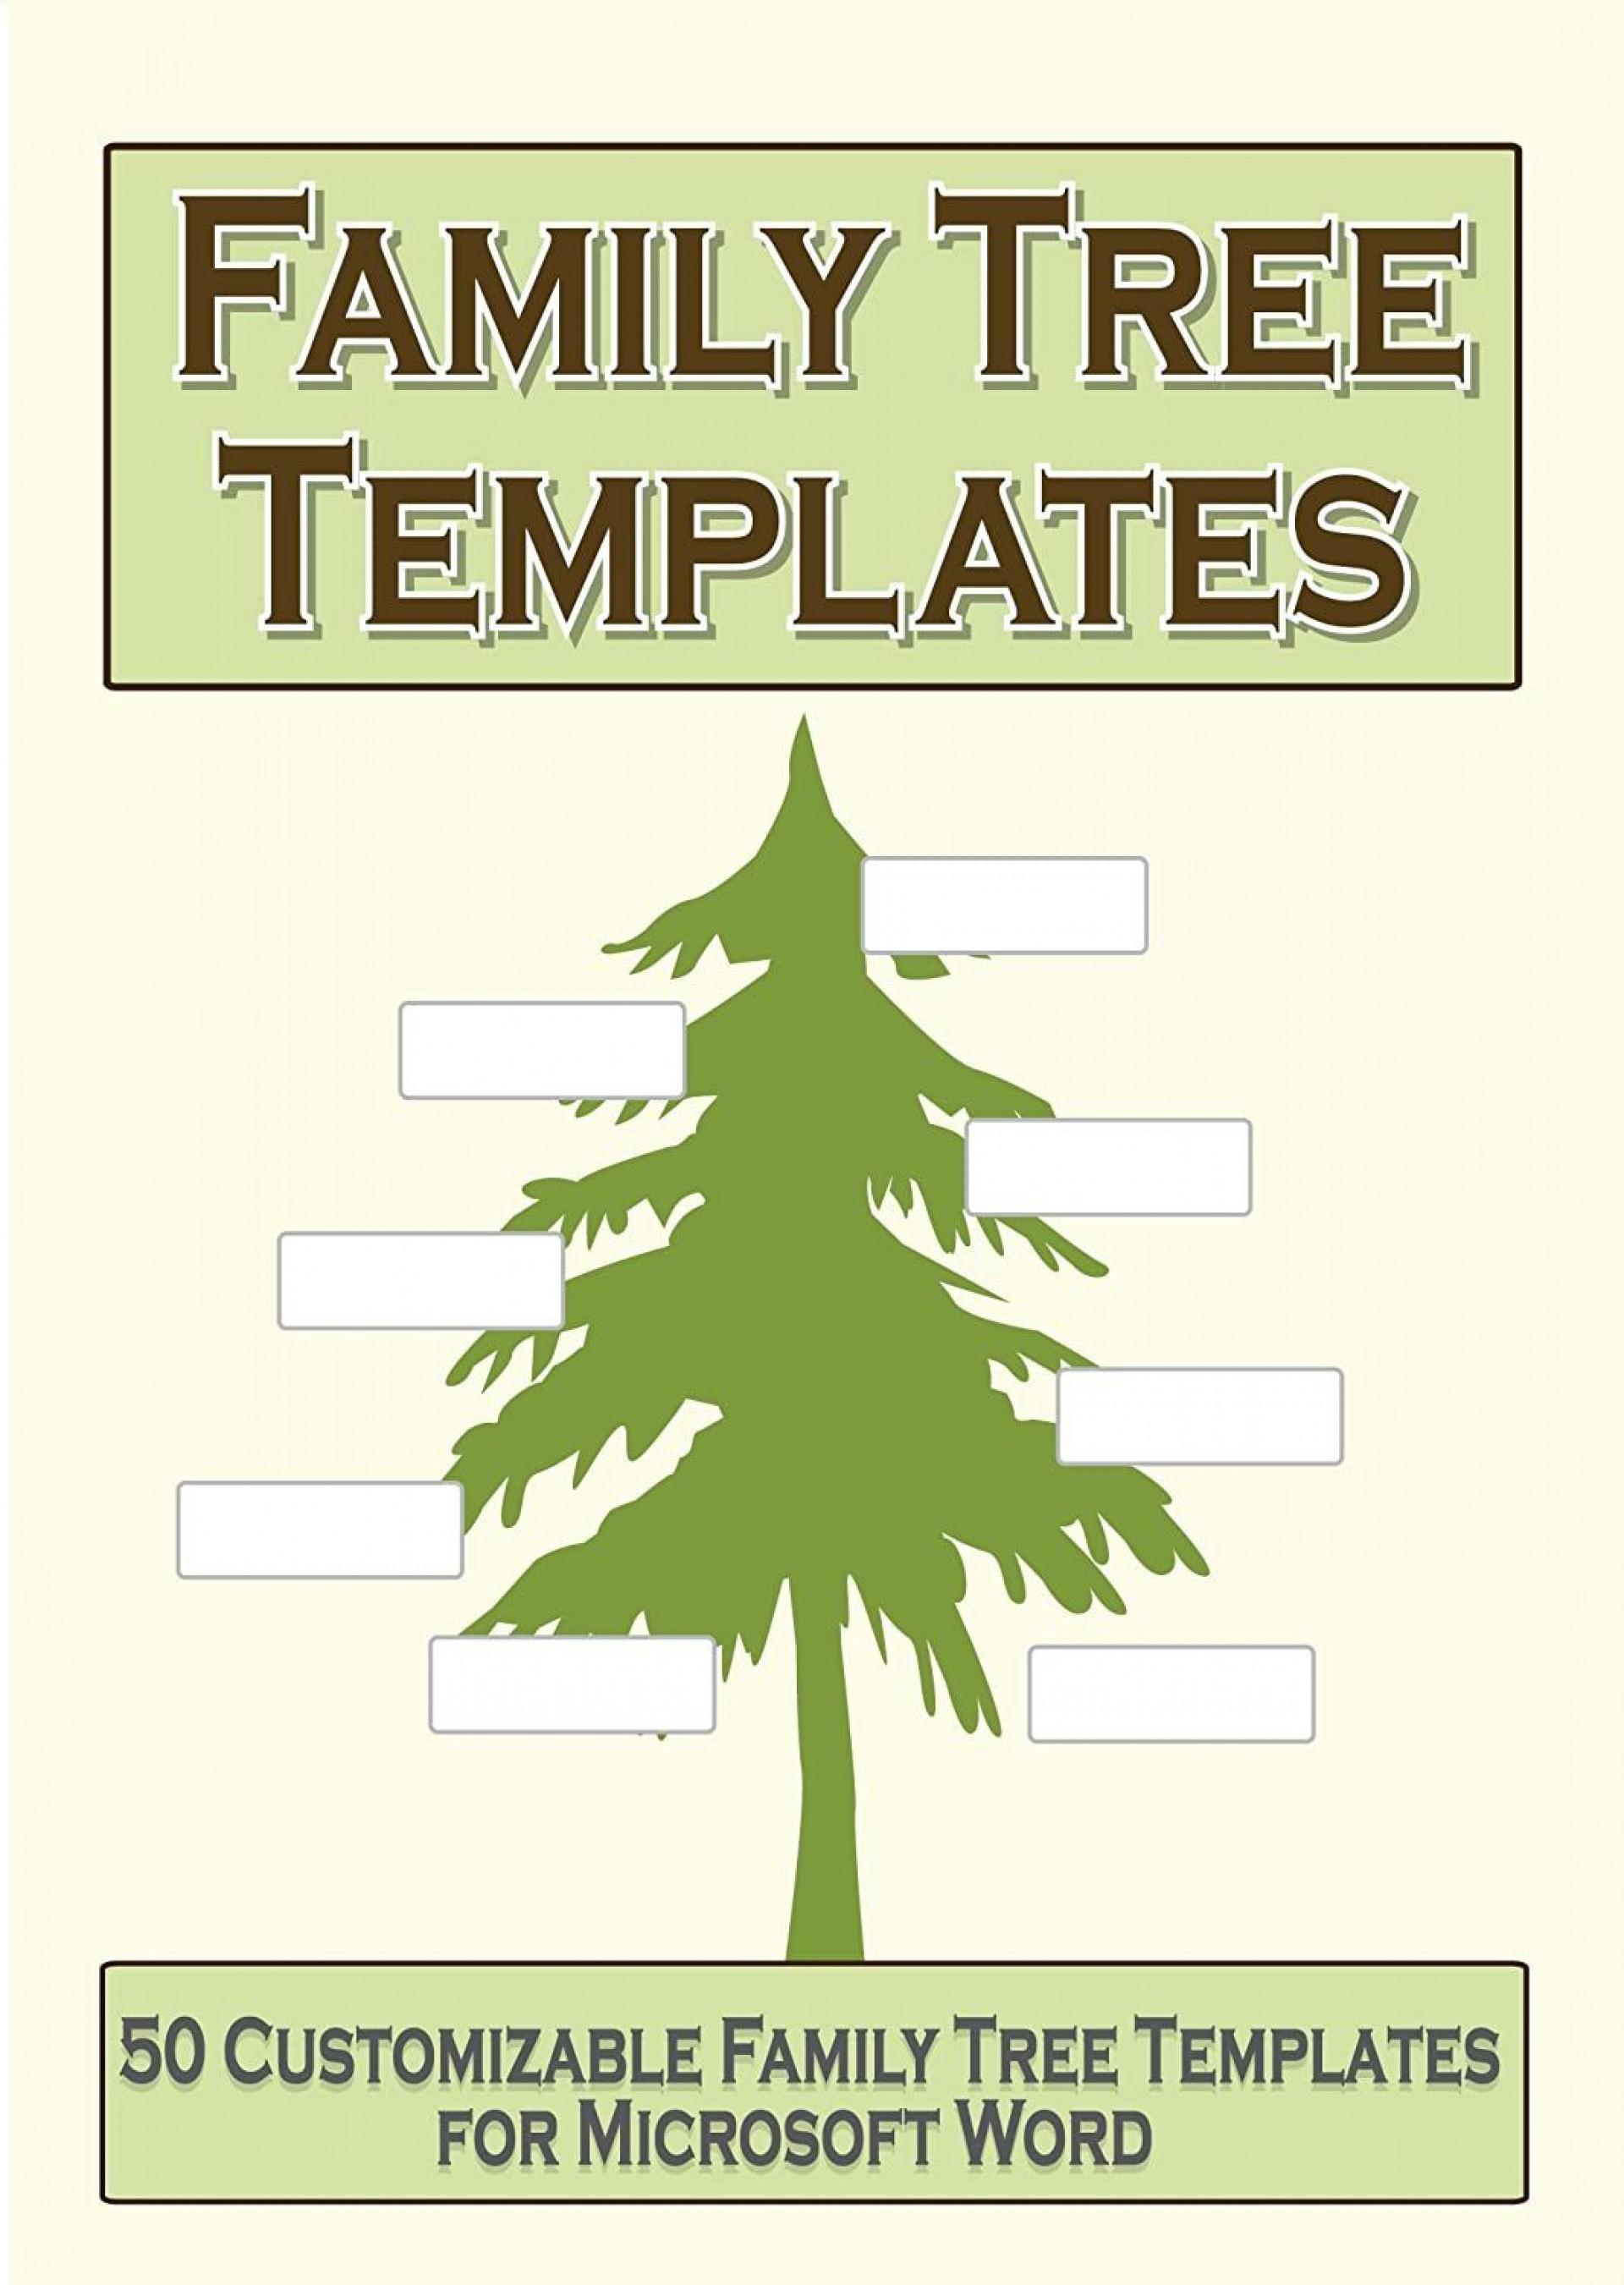 003 Impressive Family Tree Book Template Word Photo  History1920